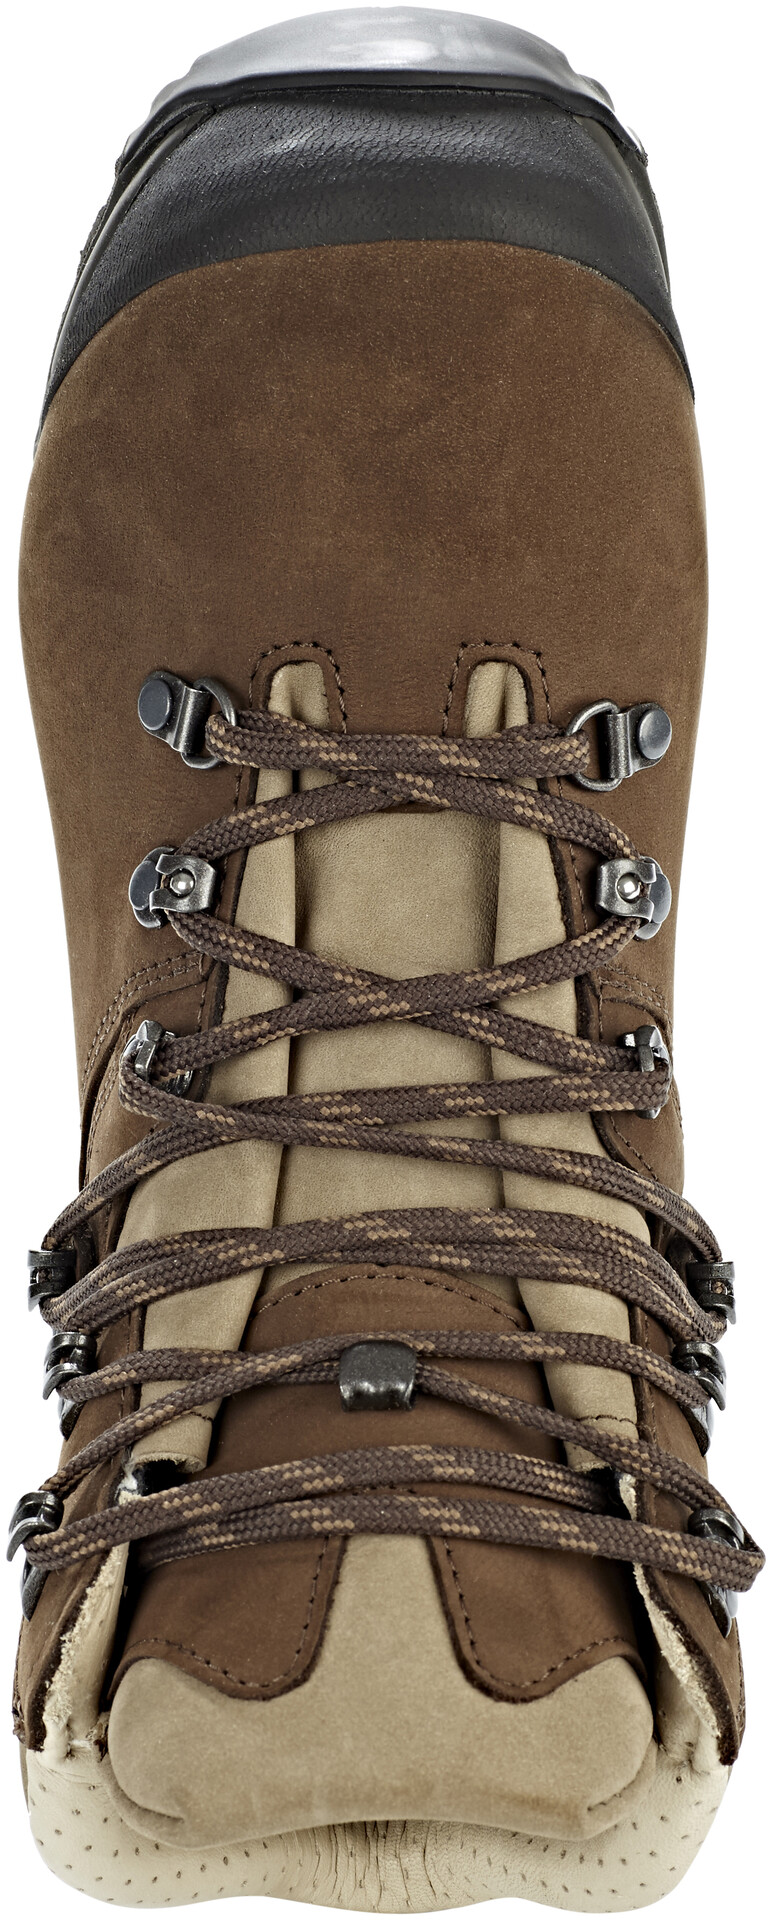 Women Footwear Brown Tatra Shoes 2019 Gtx Hanwag Ii Narrow 1KTlFJc3